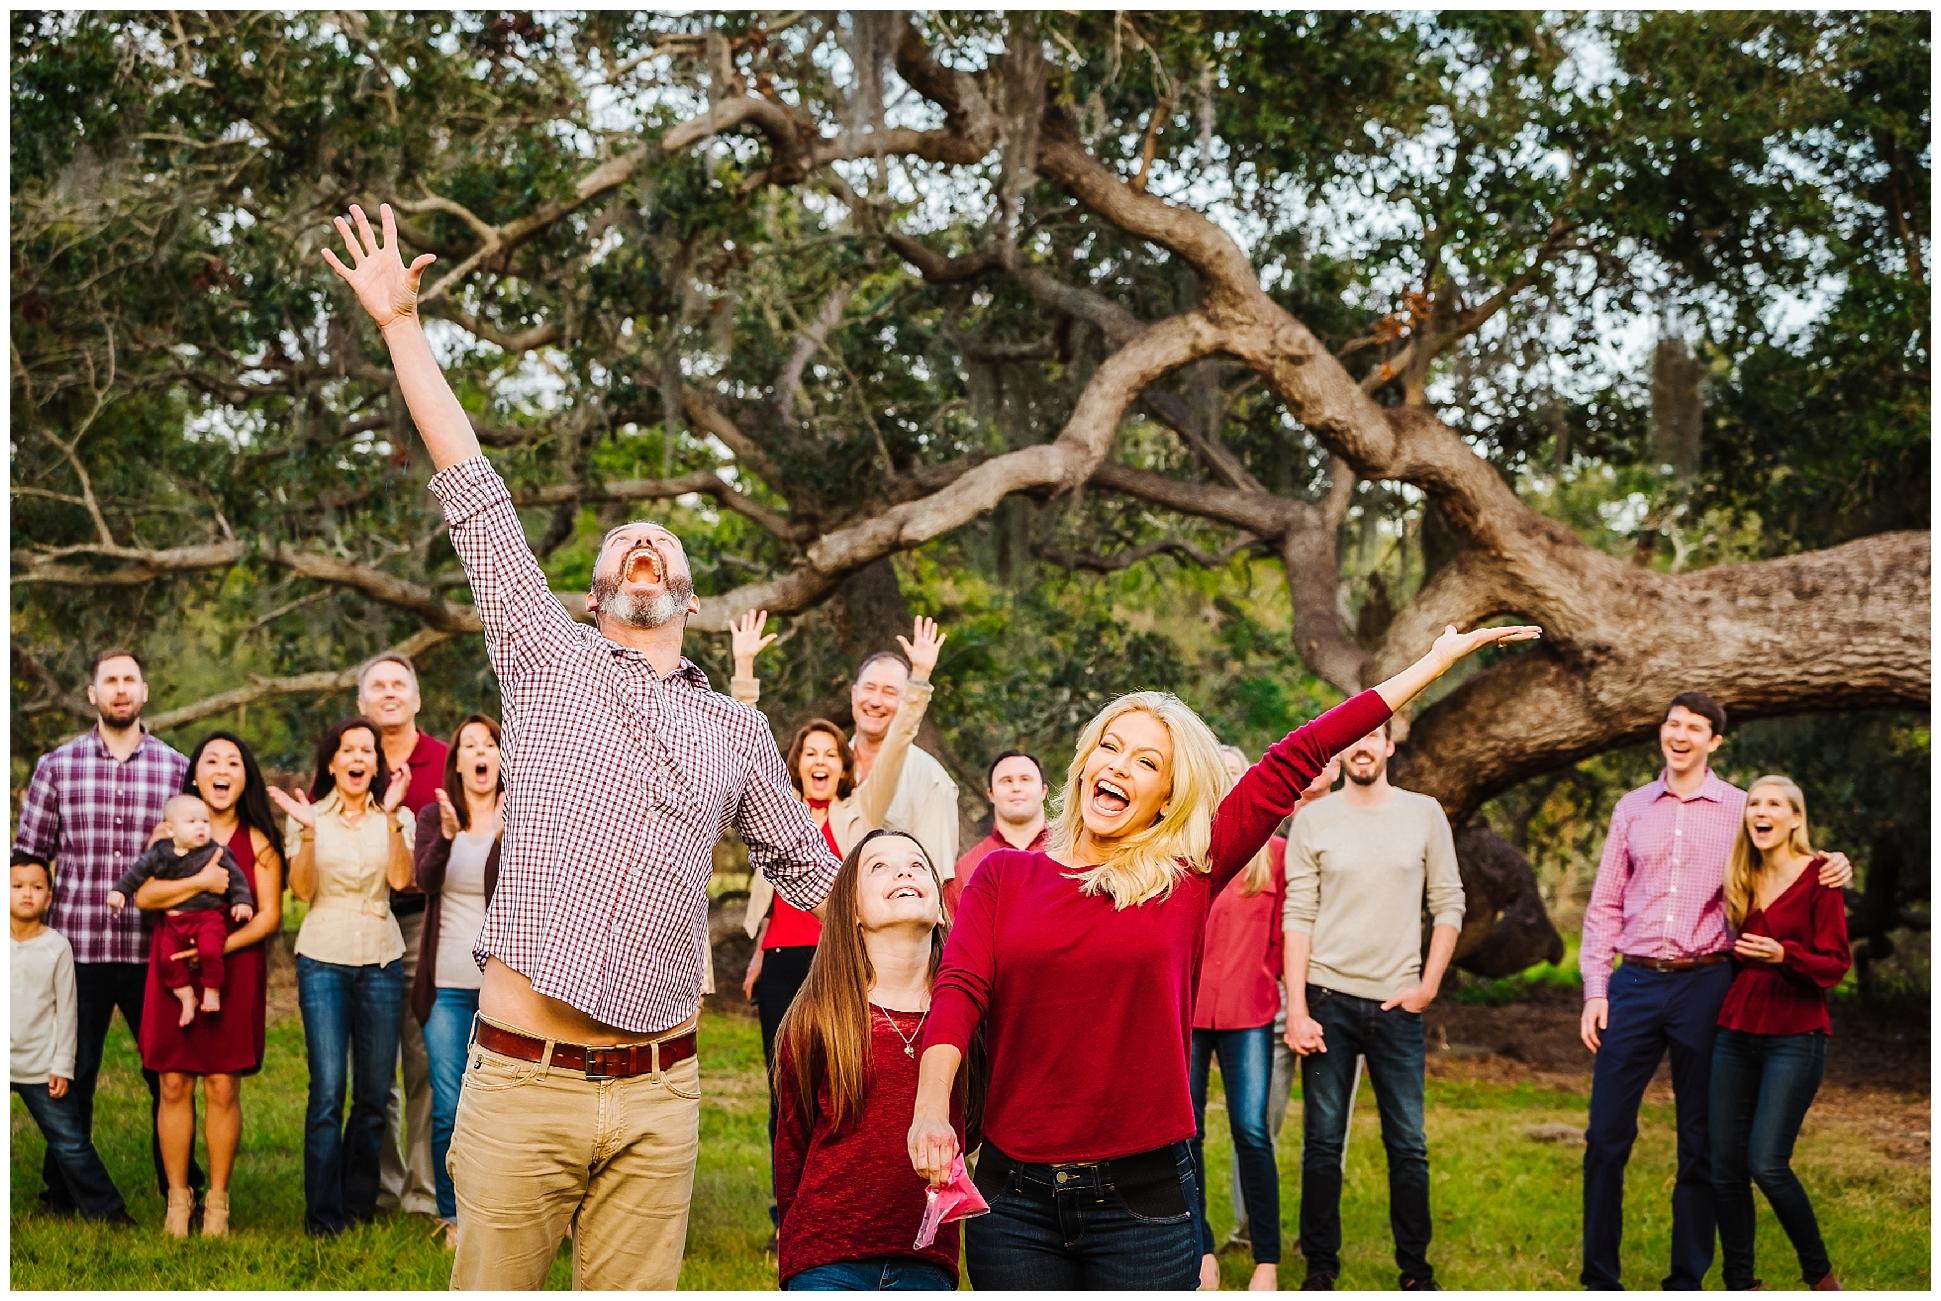 tampa-oak tree-park-holiday-gender reveal-family session_0041.jpg